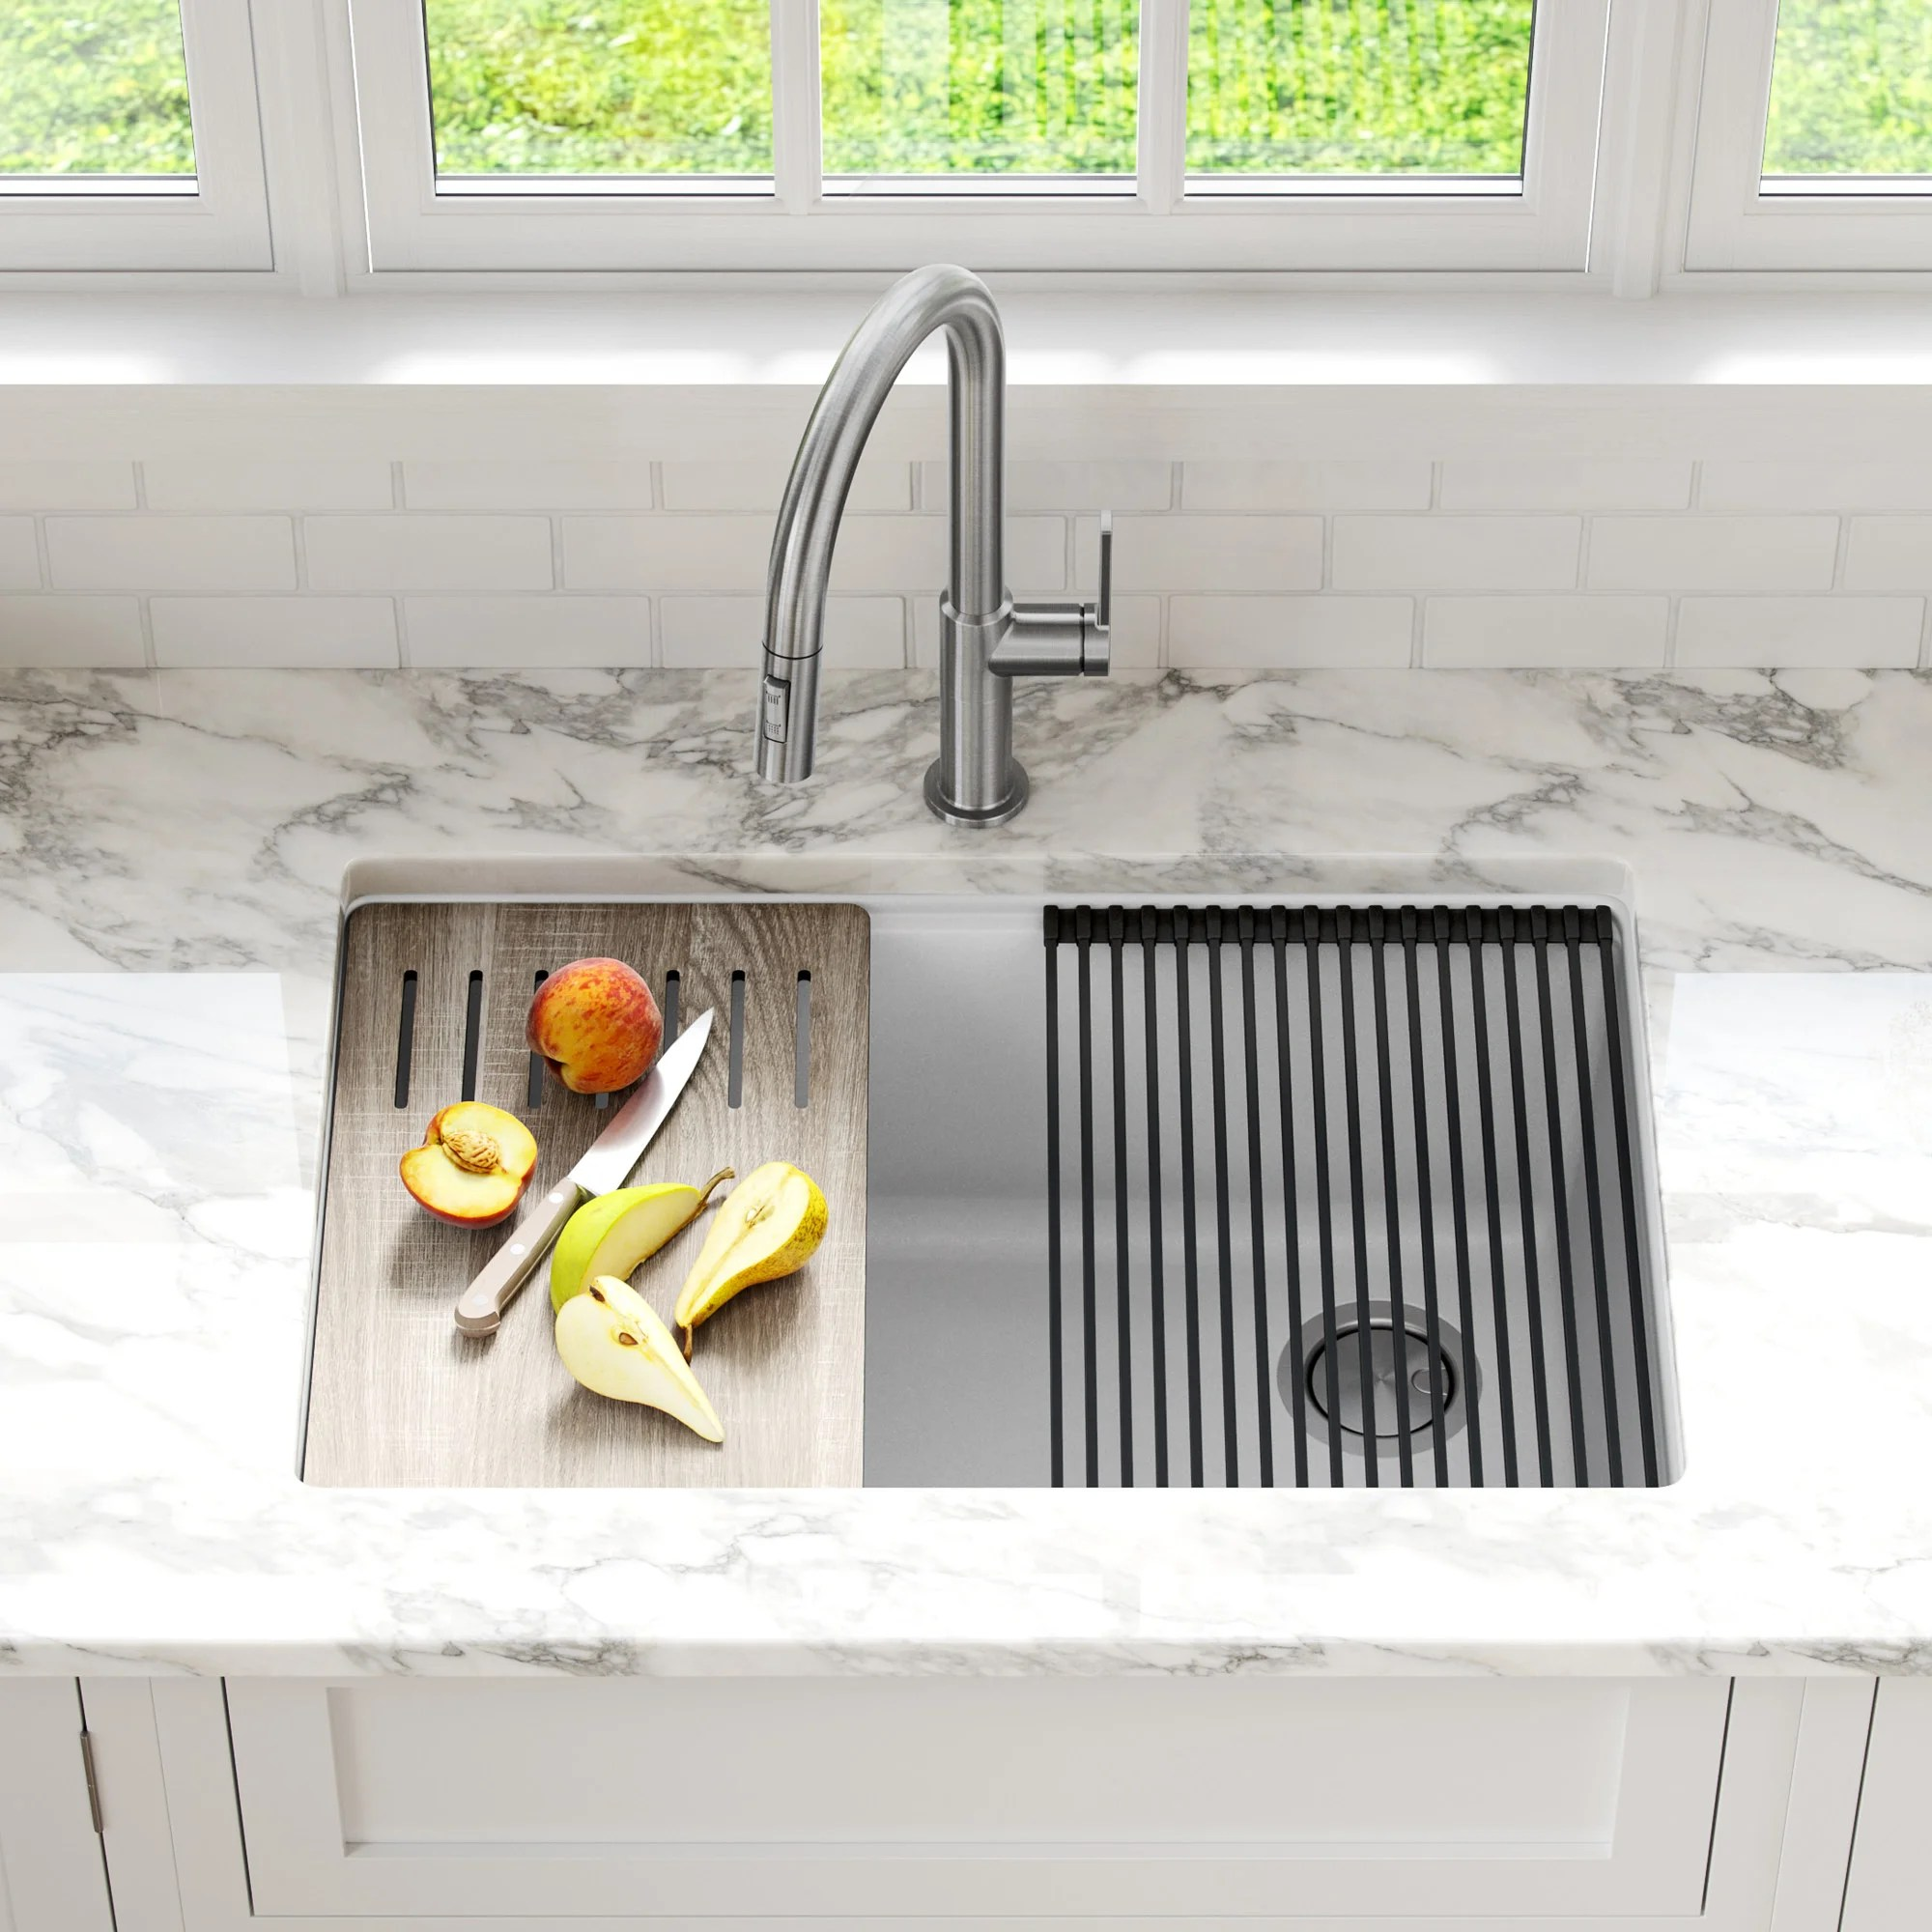 kraus bellucci workstation 30 inch undermount granite composite single bowl kitchen sink in white with accessories kguw1 30wh